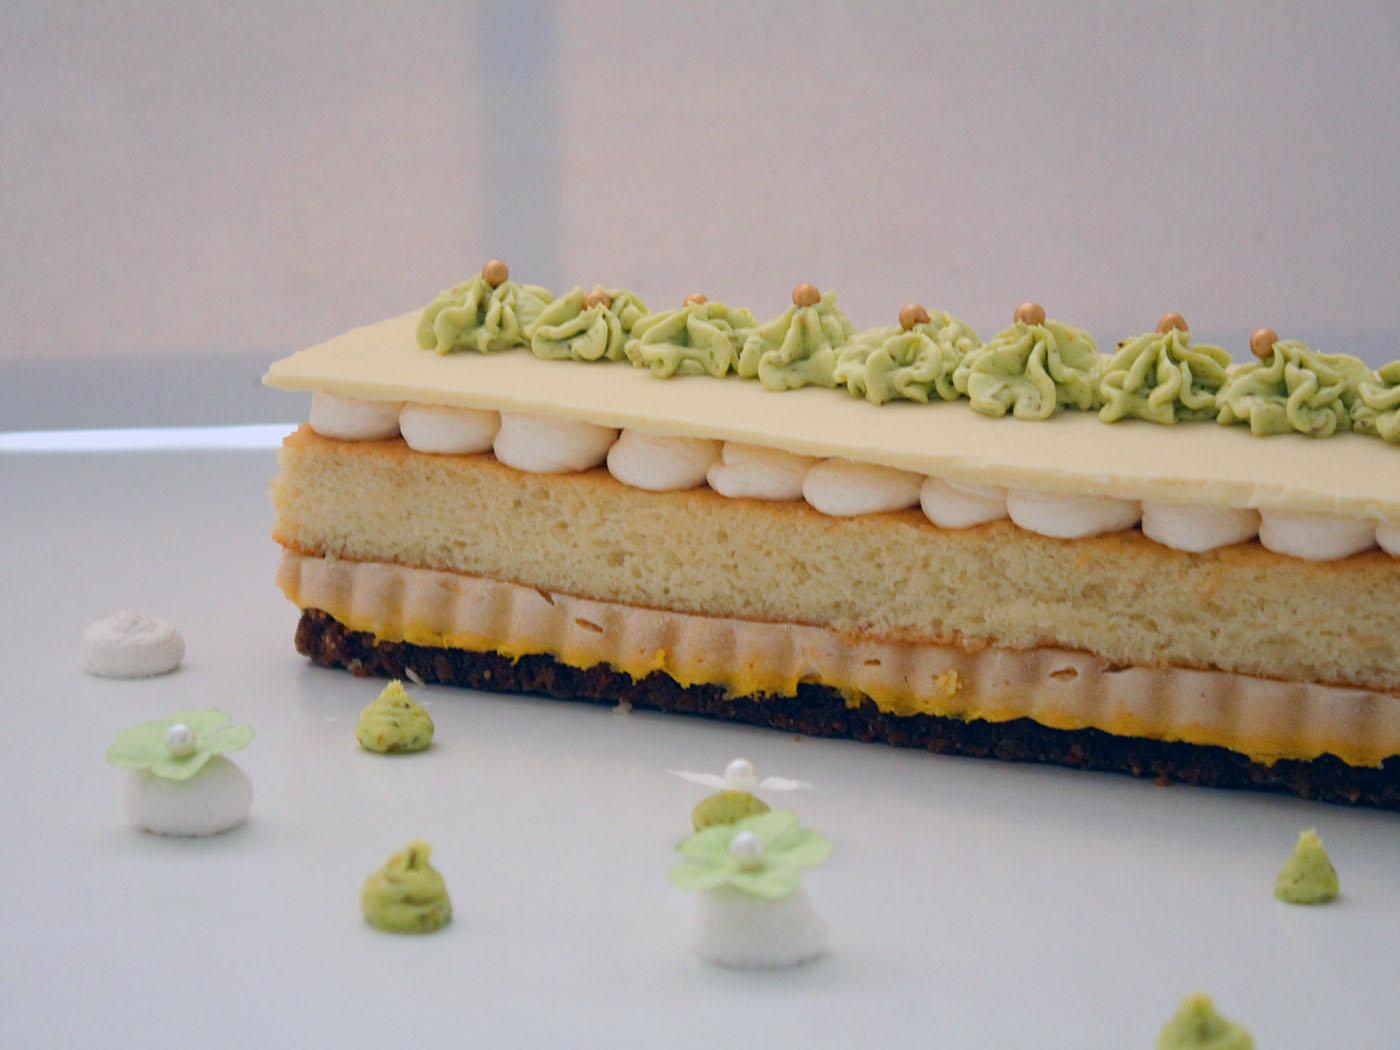 IMG 9277 - עוגת שכבות אקזותית